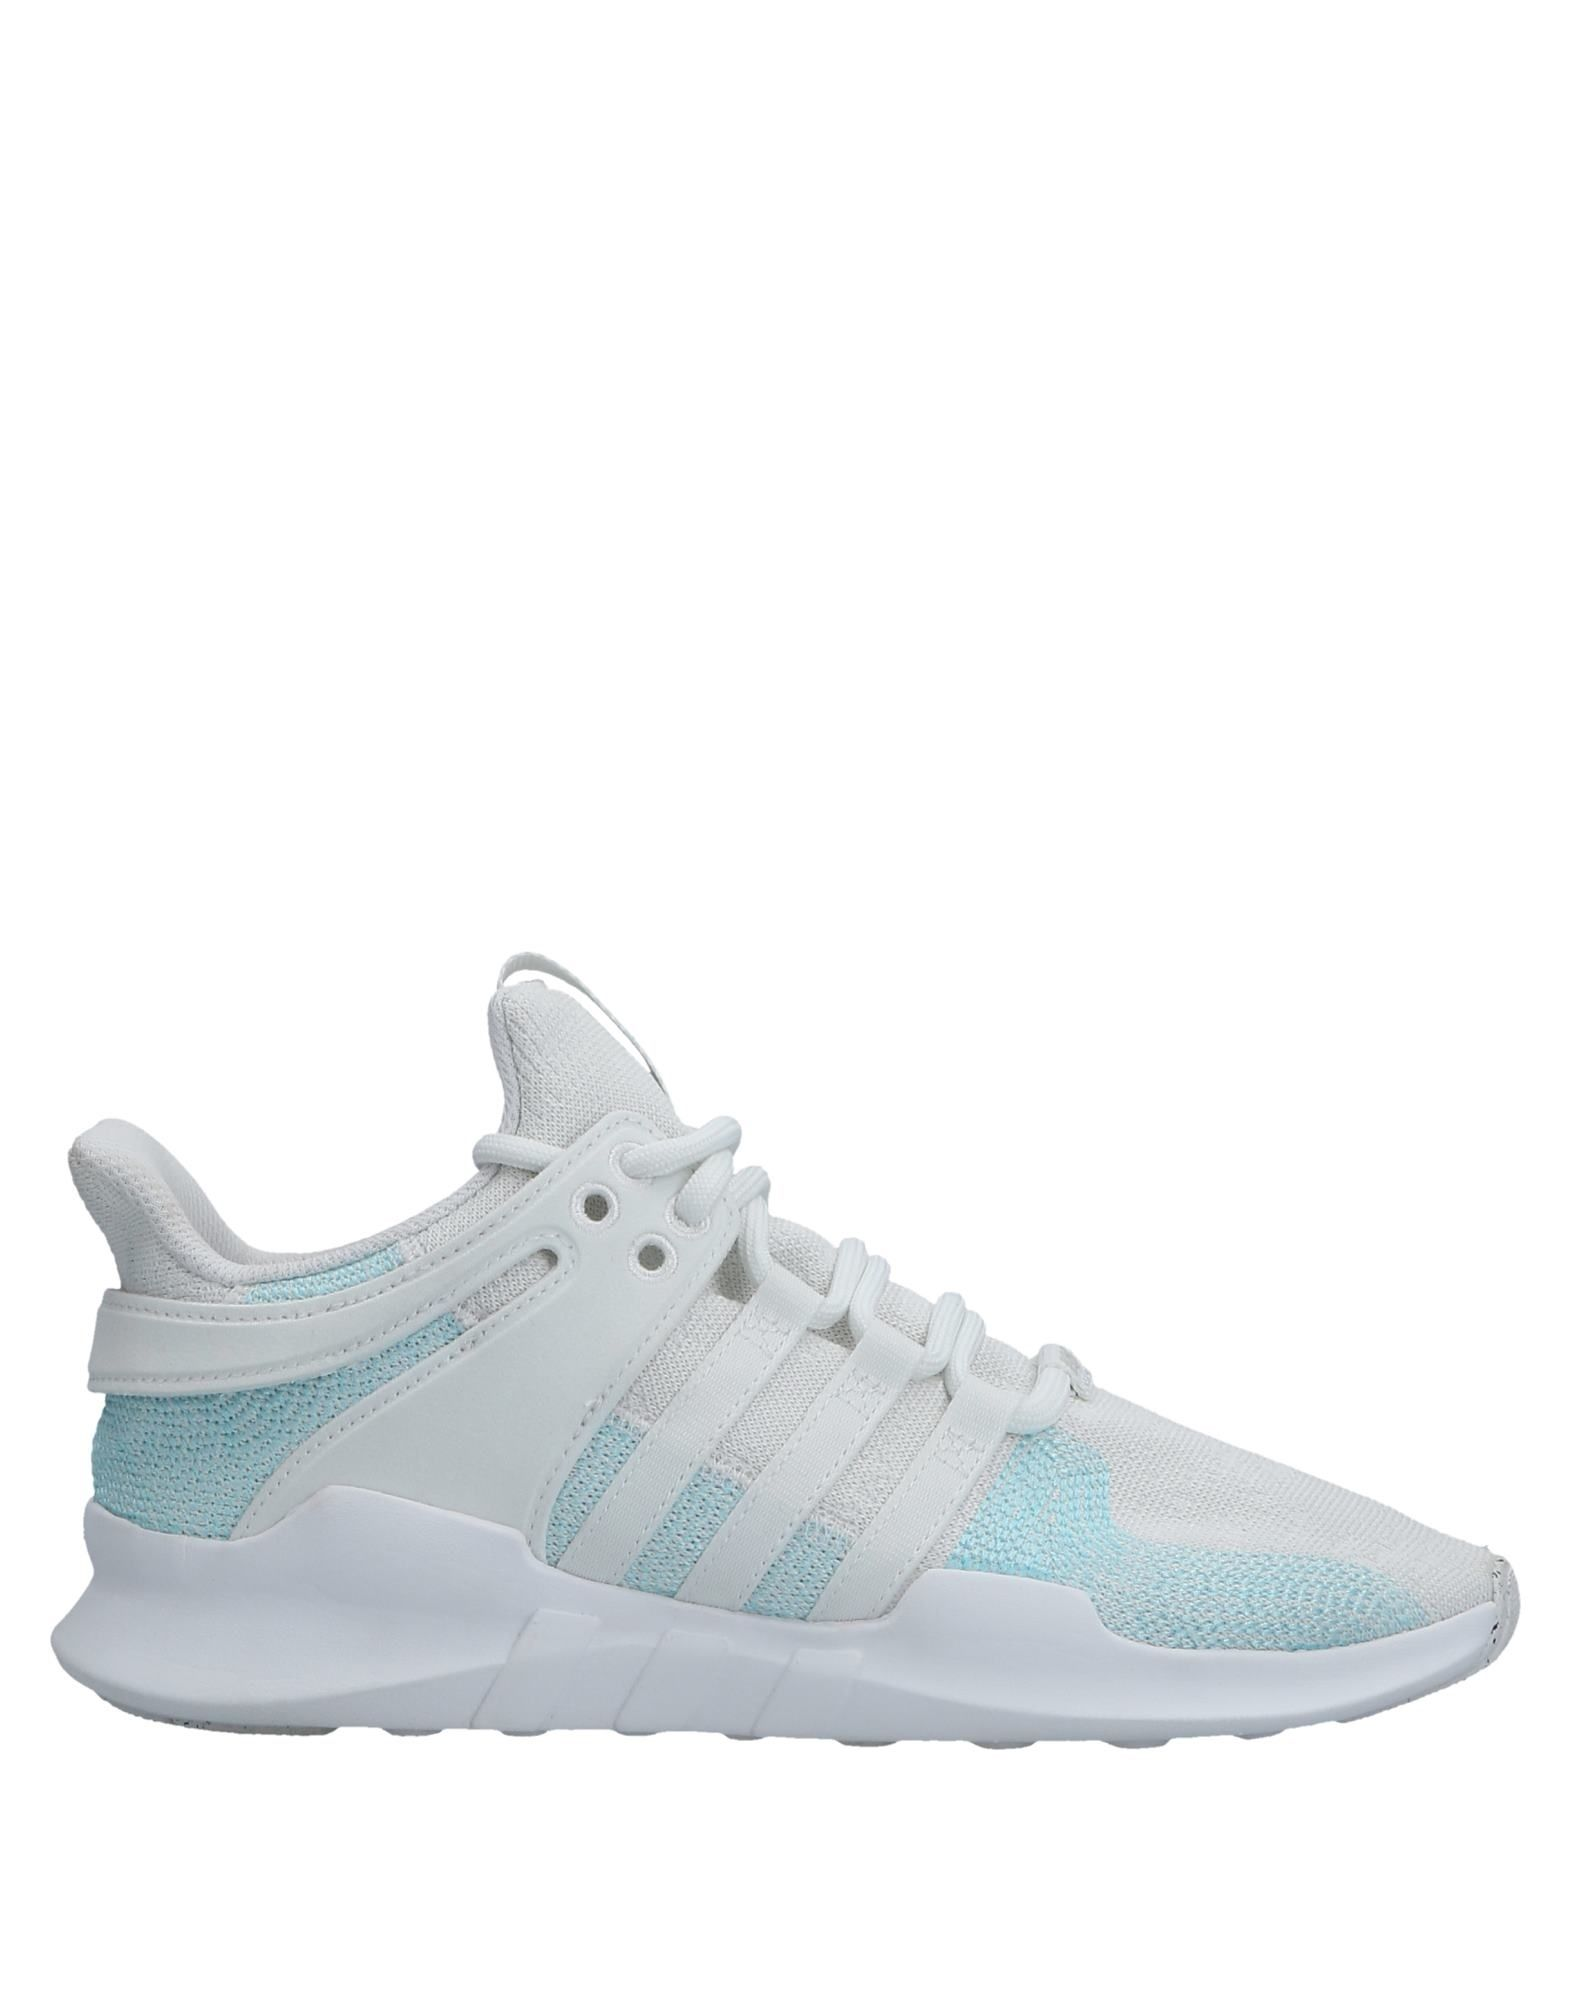 Sneakers Adidas Originals Uomo - 11531772FN